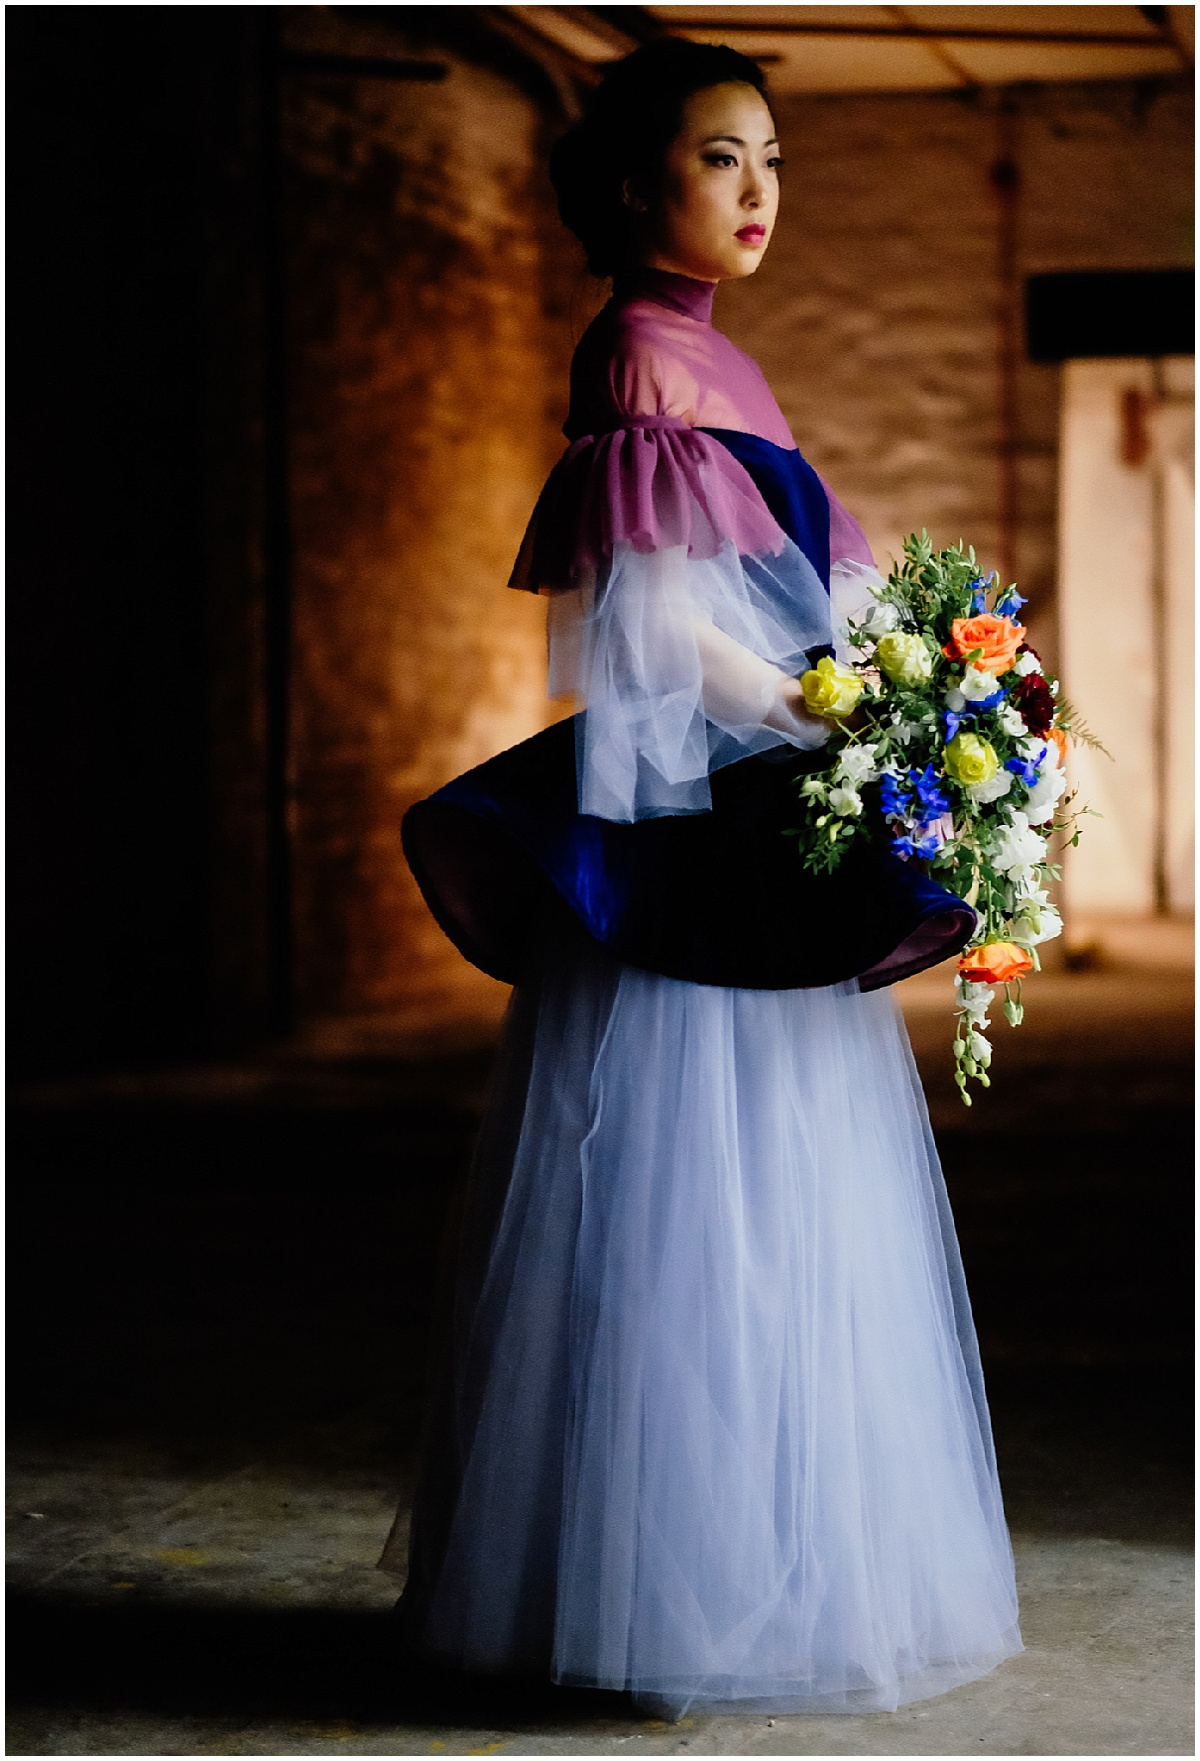 Woodeside Warehouse Wedding Photographs_005.jpg